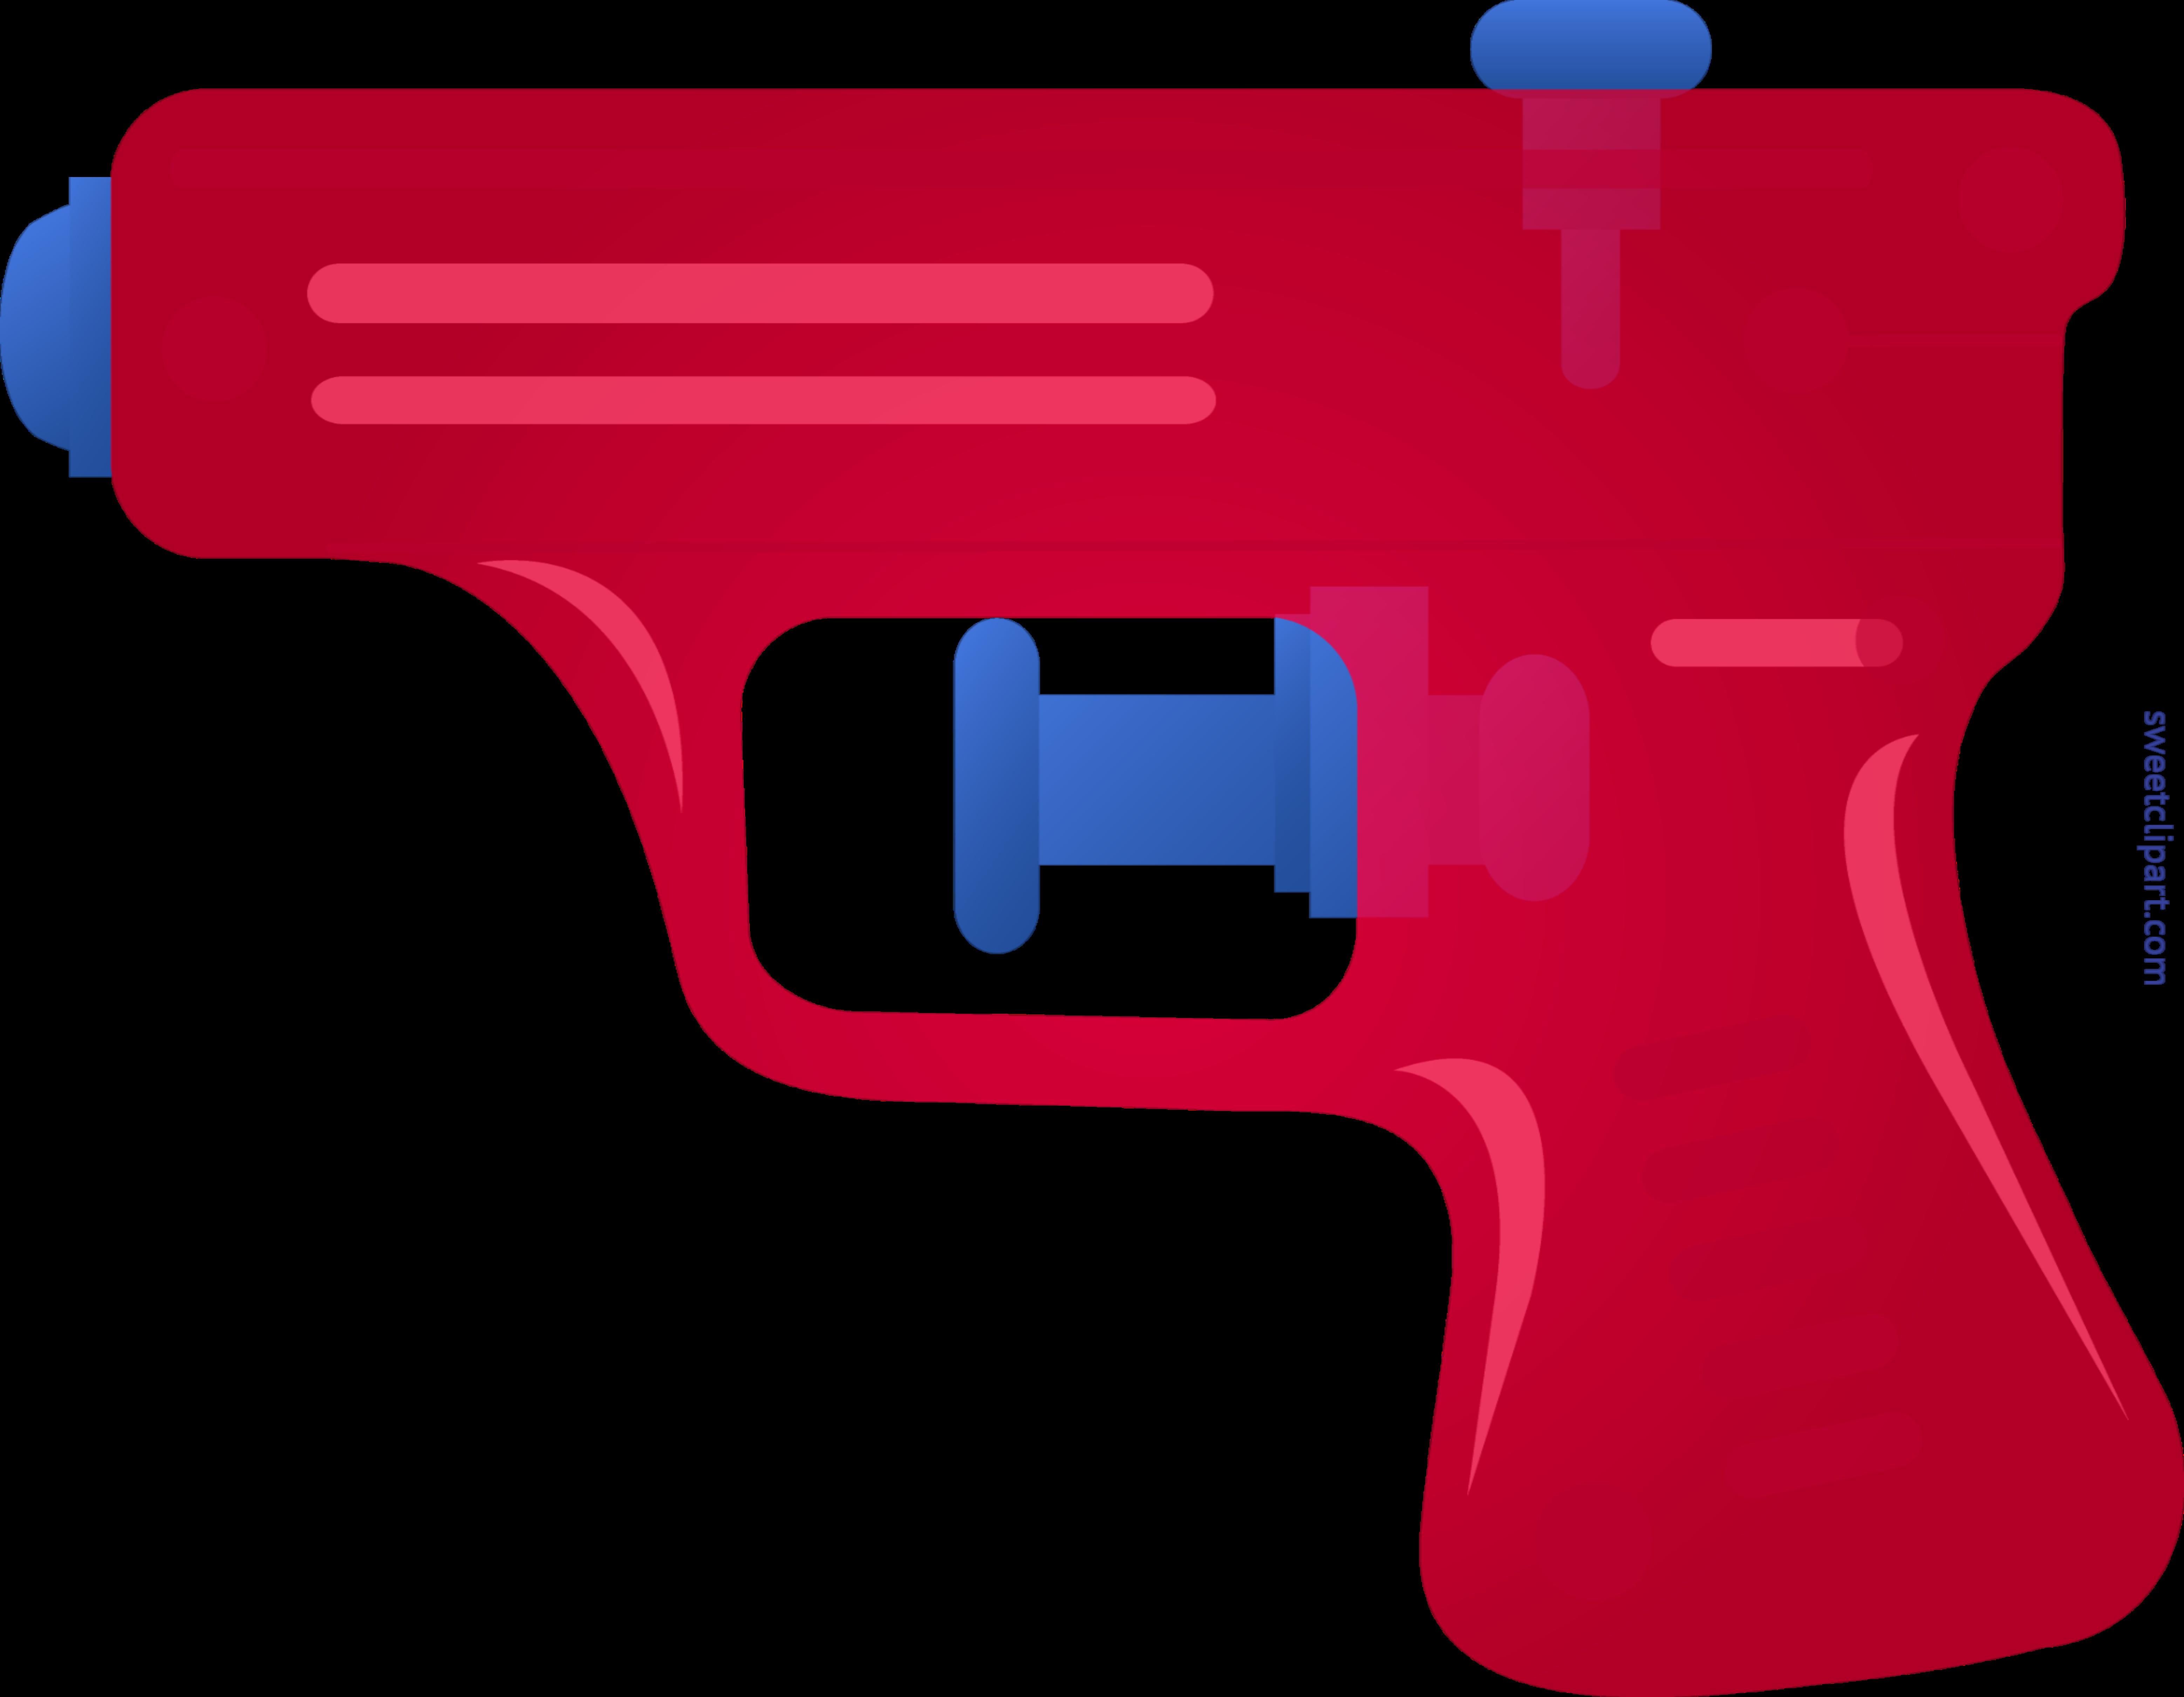 Squirt red clip sweet. Clipart gun line art